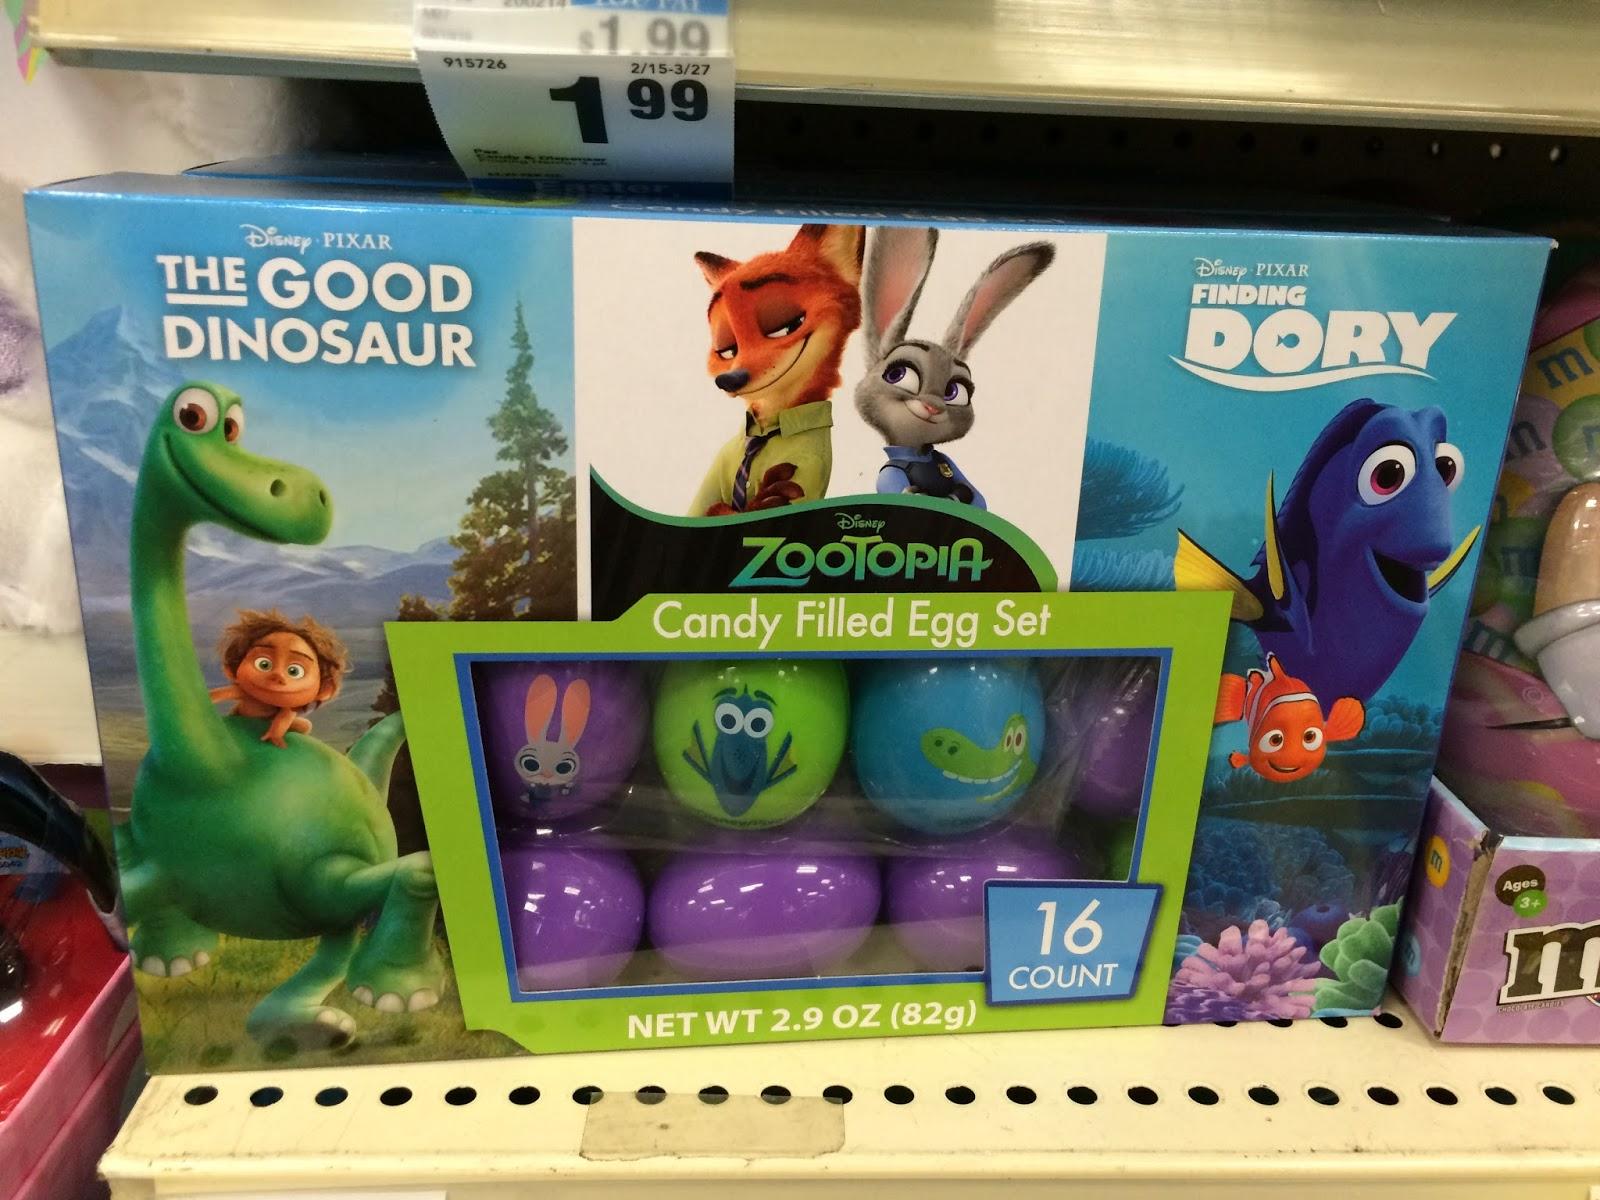 Dan the pixar fan disneypixar easter basket ideas 2016 finding disney pixar easter egg hunt zootopia good dinosaur finding dory negle Gallery